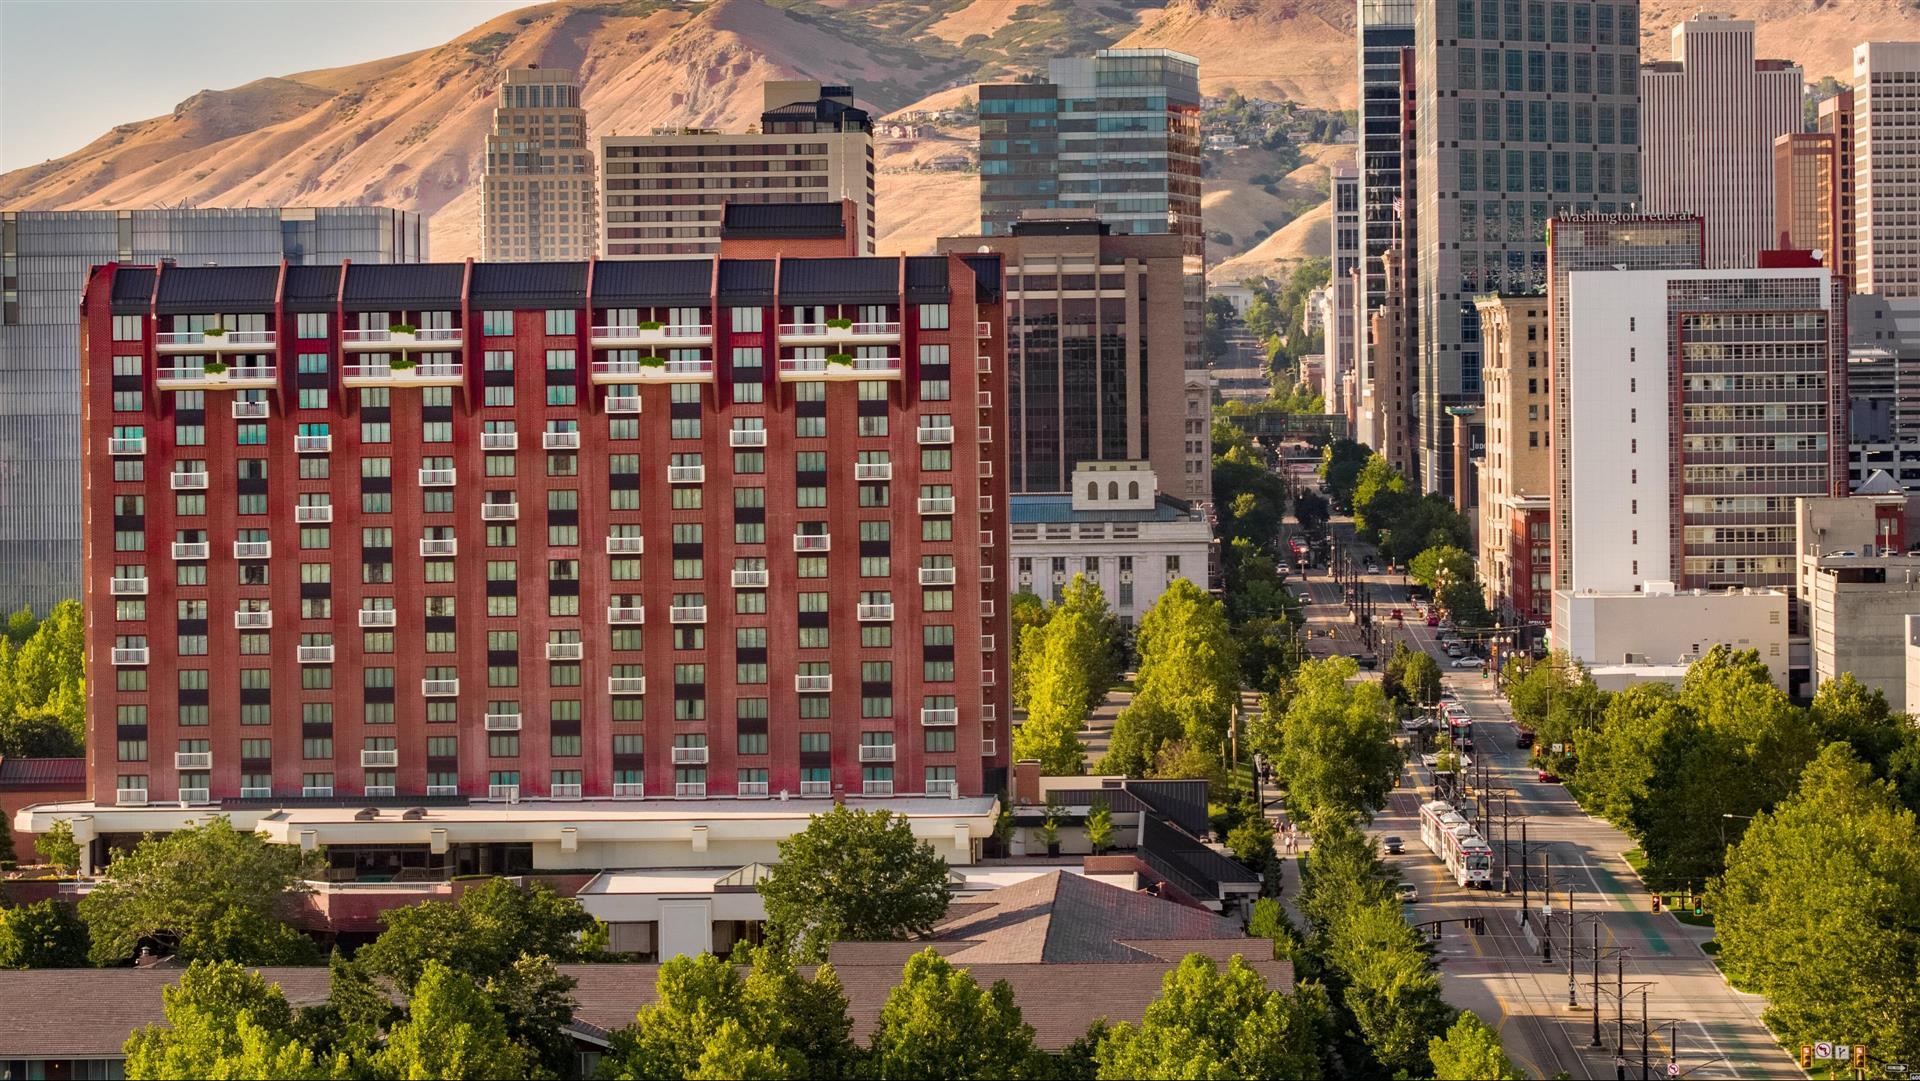 Meetings And Events At Little America Salt Lake City Salt Lake City Ut Us